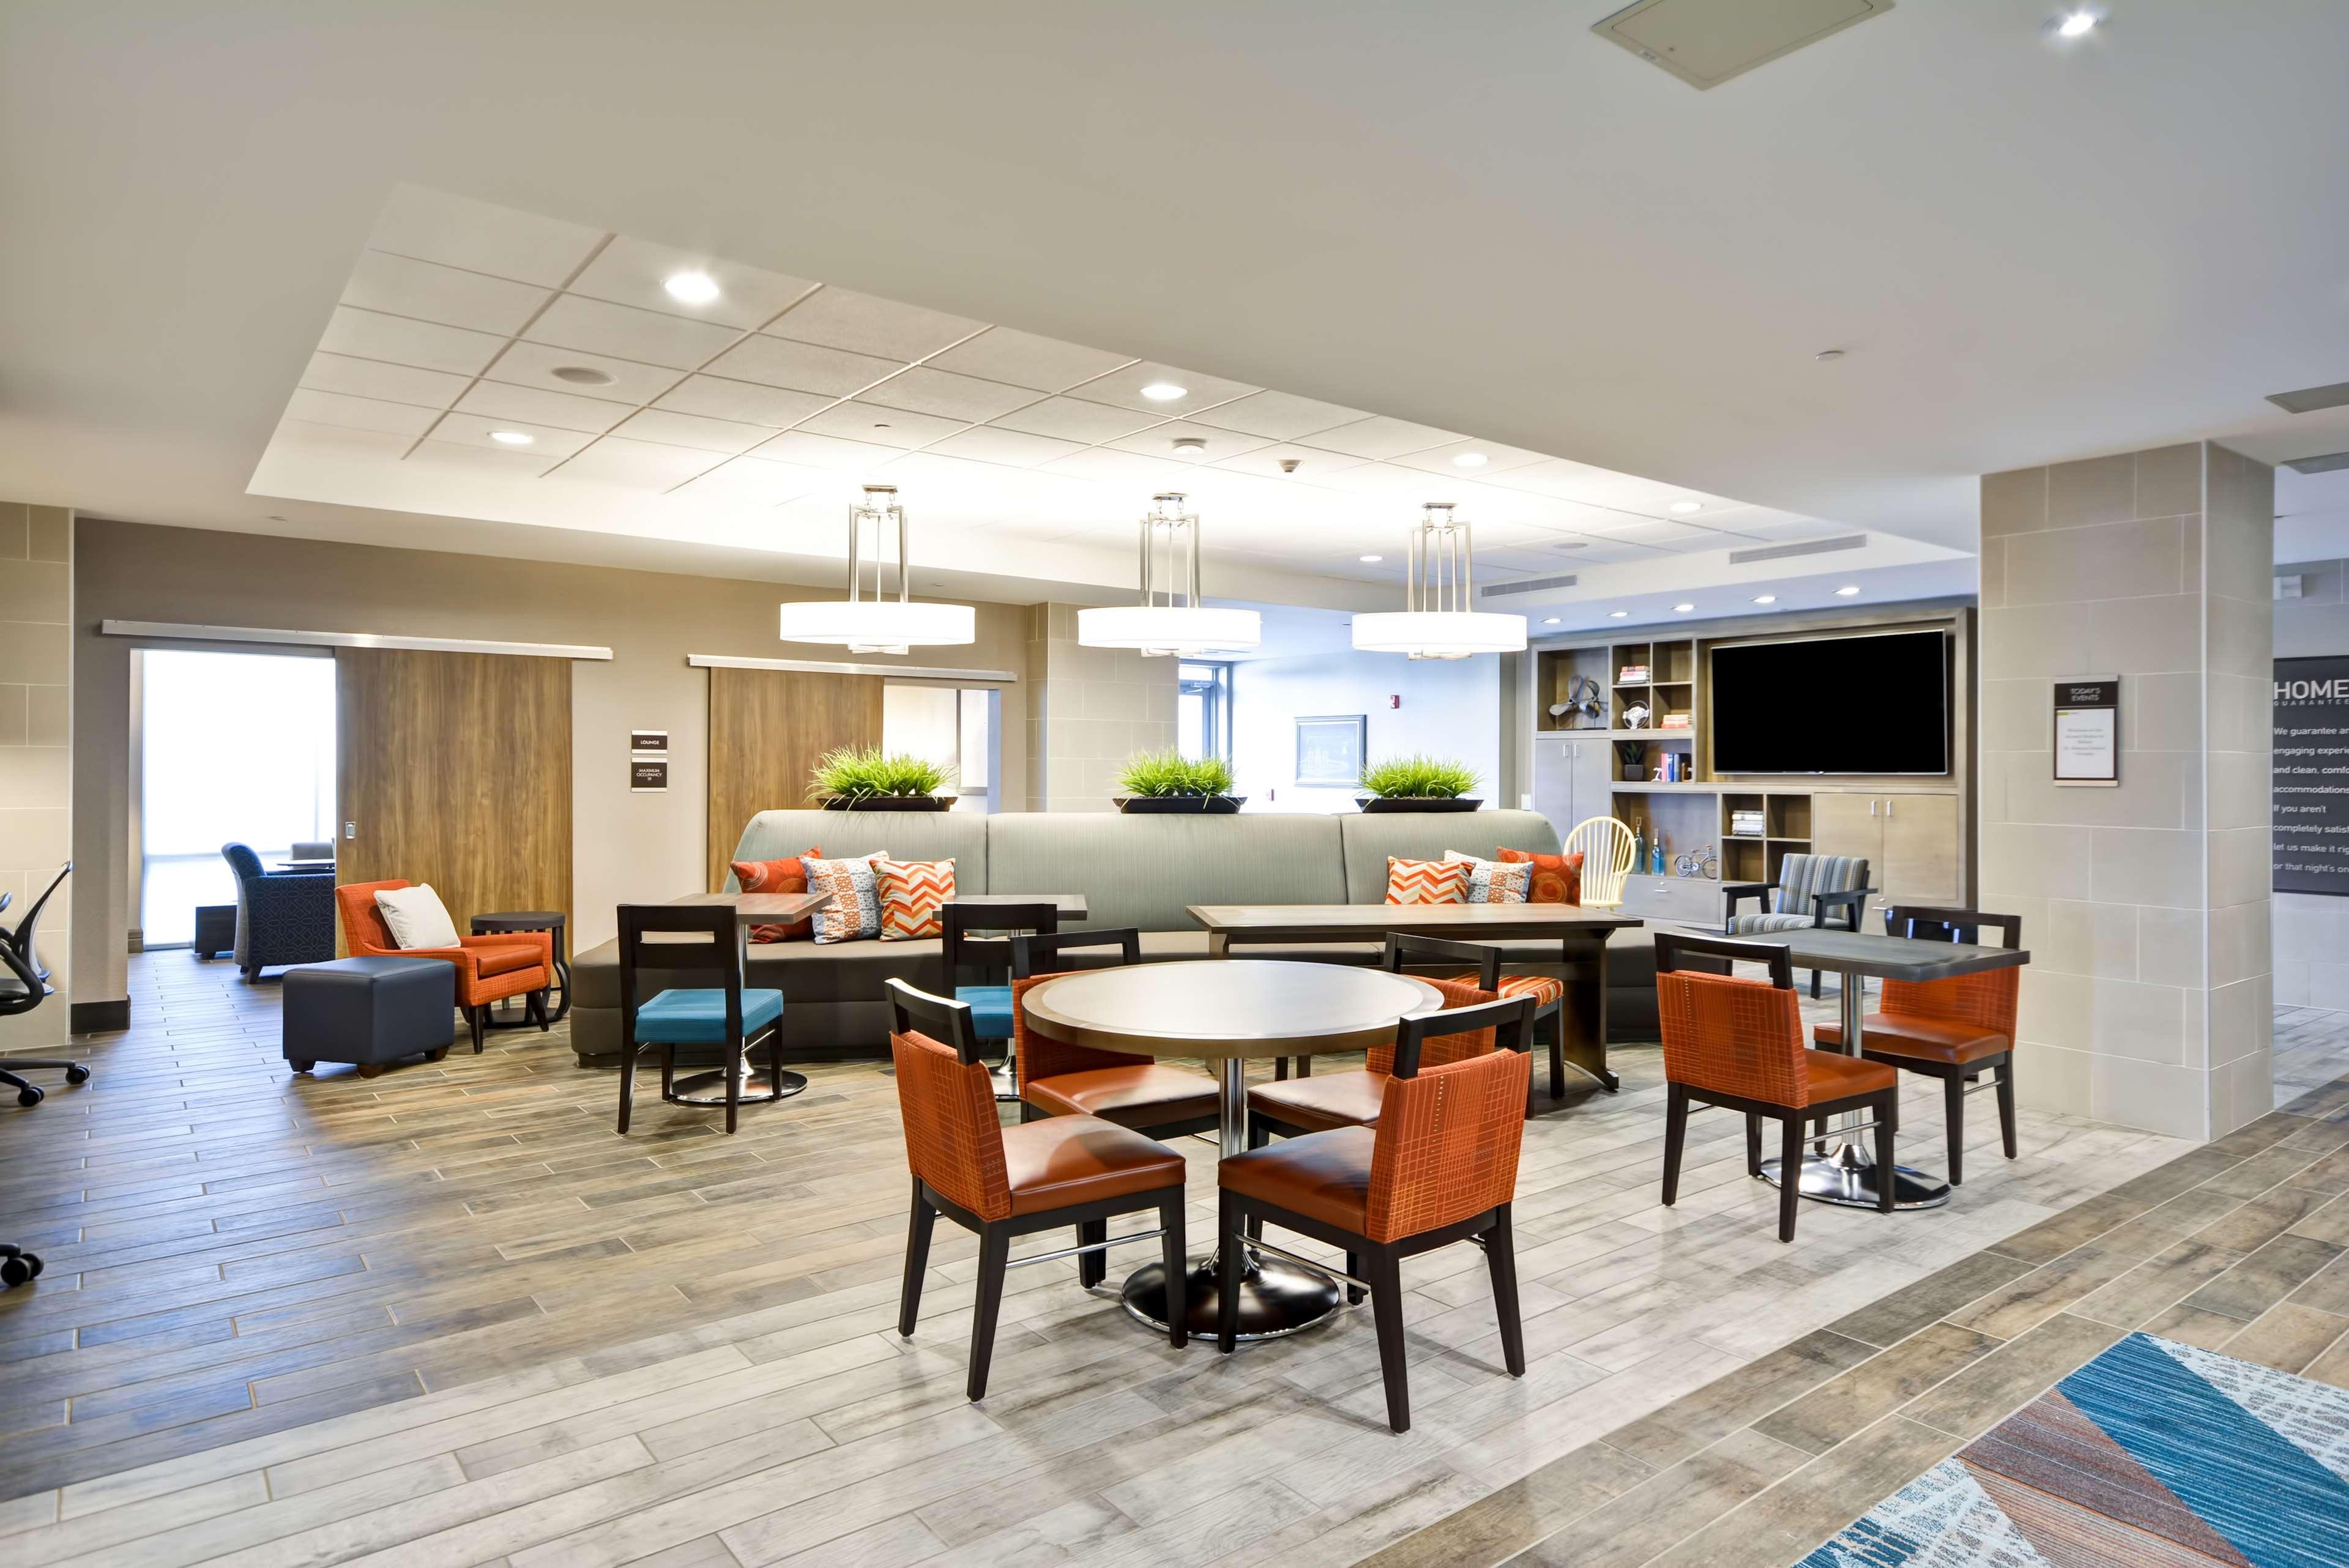 Home2 Suites by Hilton  St. Simons Island image 10